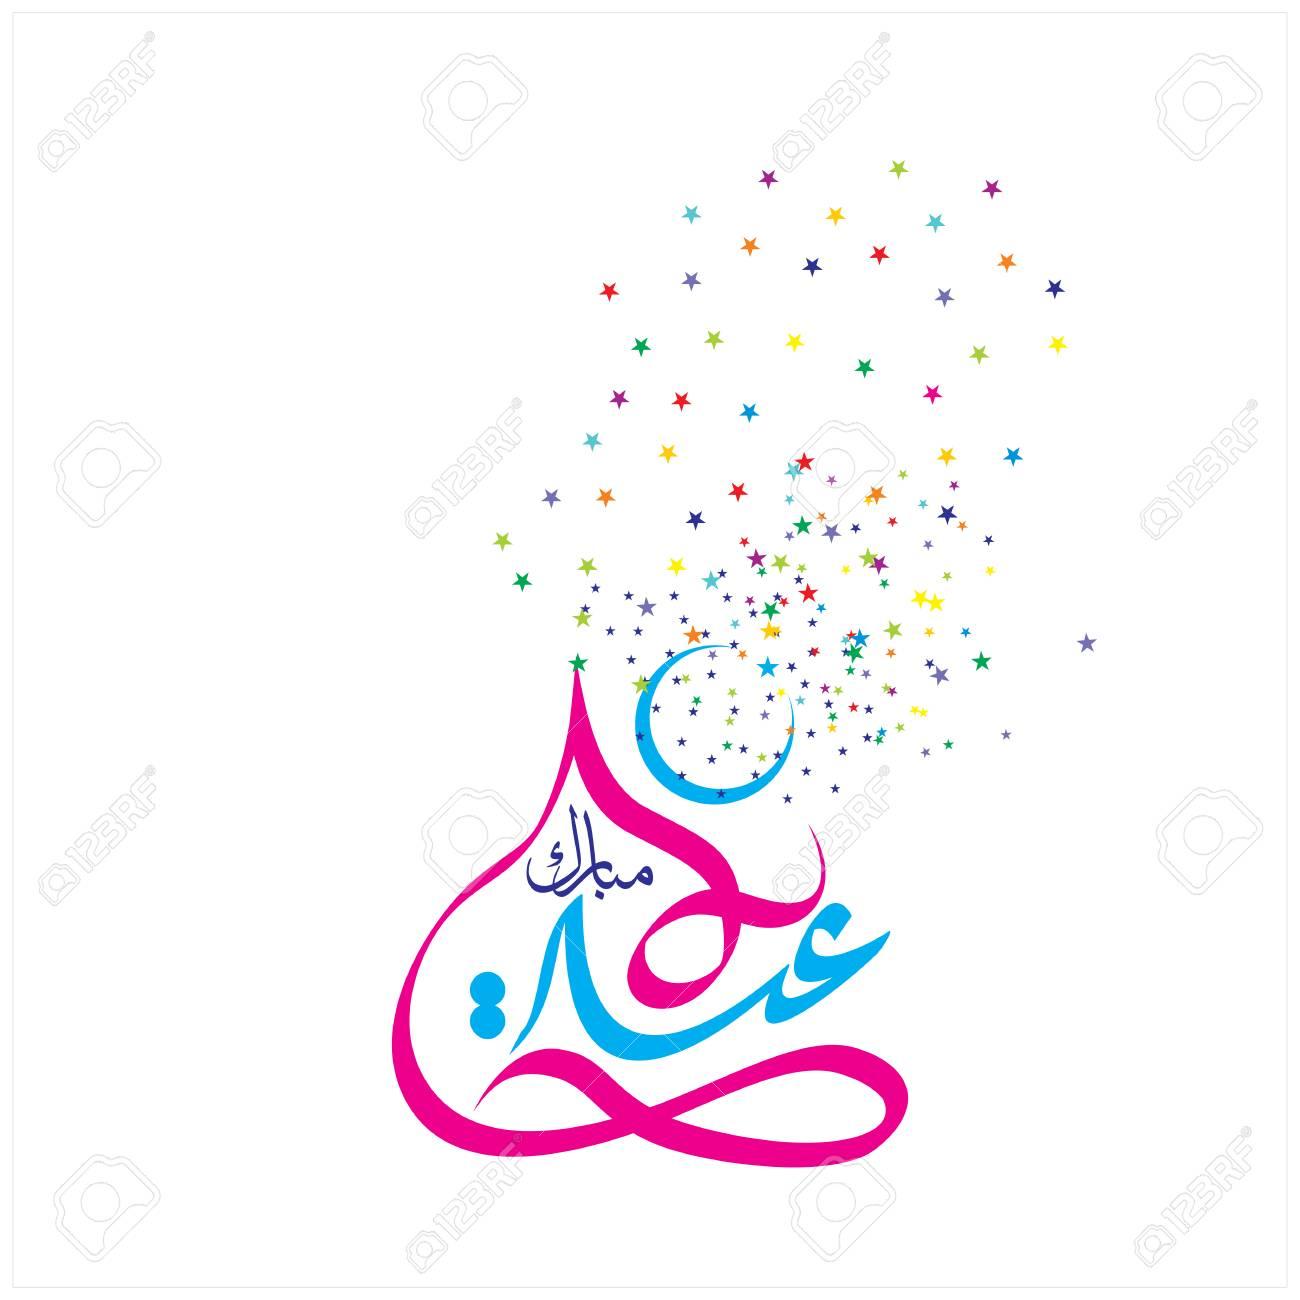 Happy eid mubarak arabic calligraphy for greeting card muslims happy eid mubarak arabic calligraphy for greeting card muslims celebrating festival stock vector 99825608 m4hsunfo